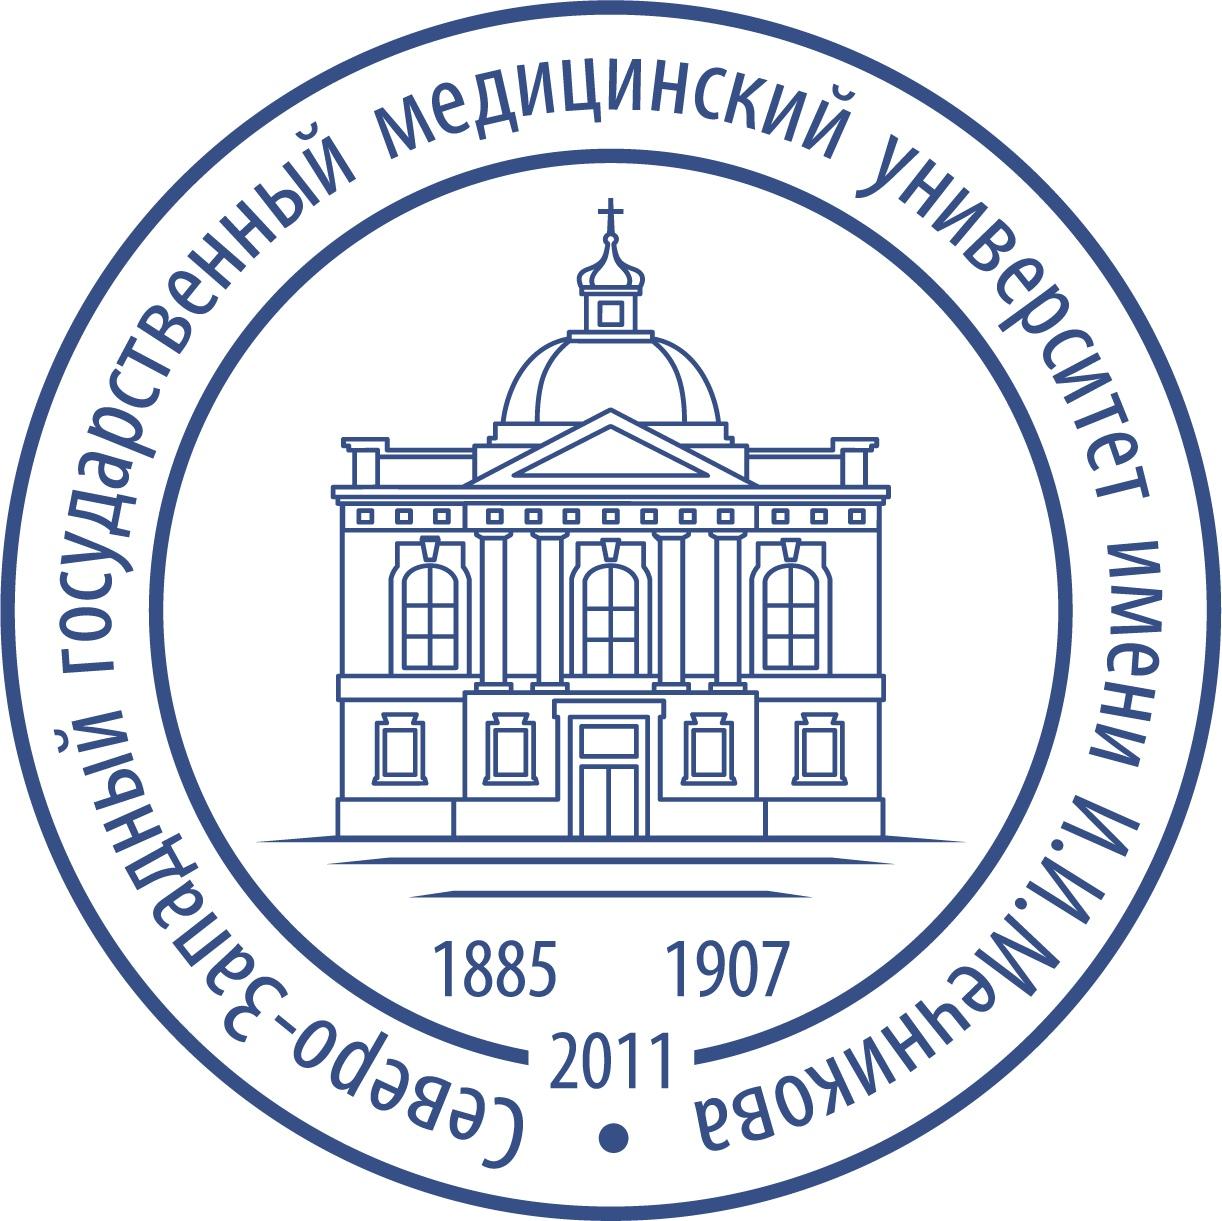 ФГБОУ ВО «СЗГМУ им. И.И. Мечникова» Минздрава России